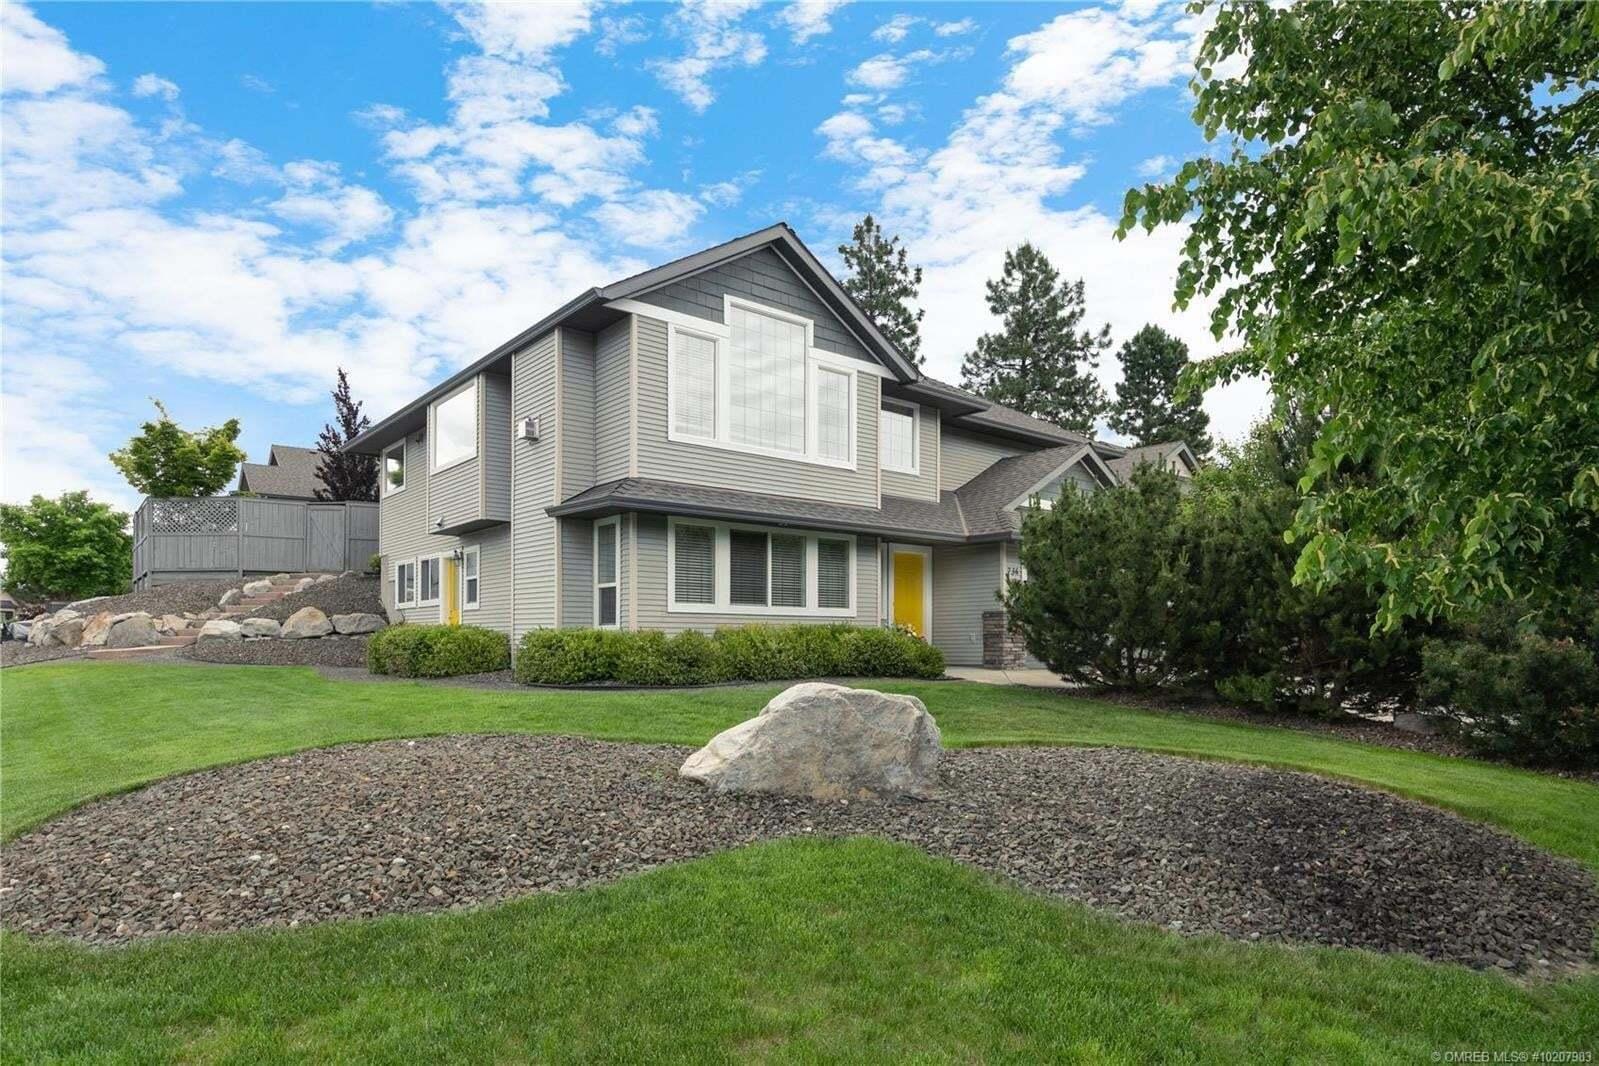 House for sale at 736 Arbor View Dr Kelowna British Columbia - MLS: 10207983